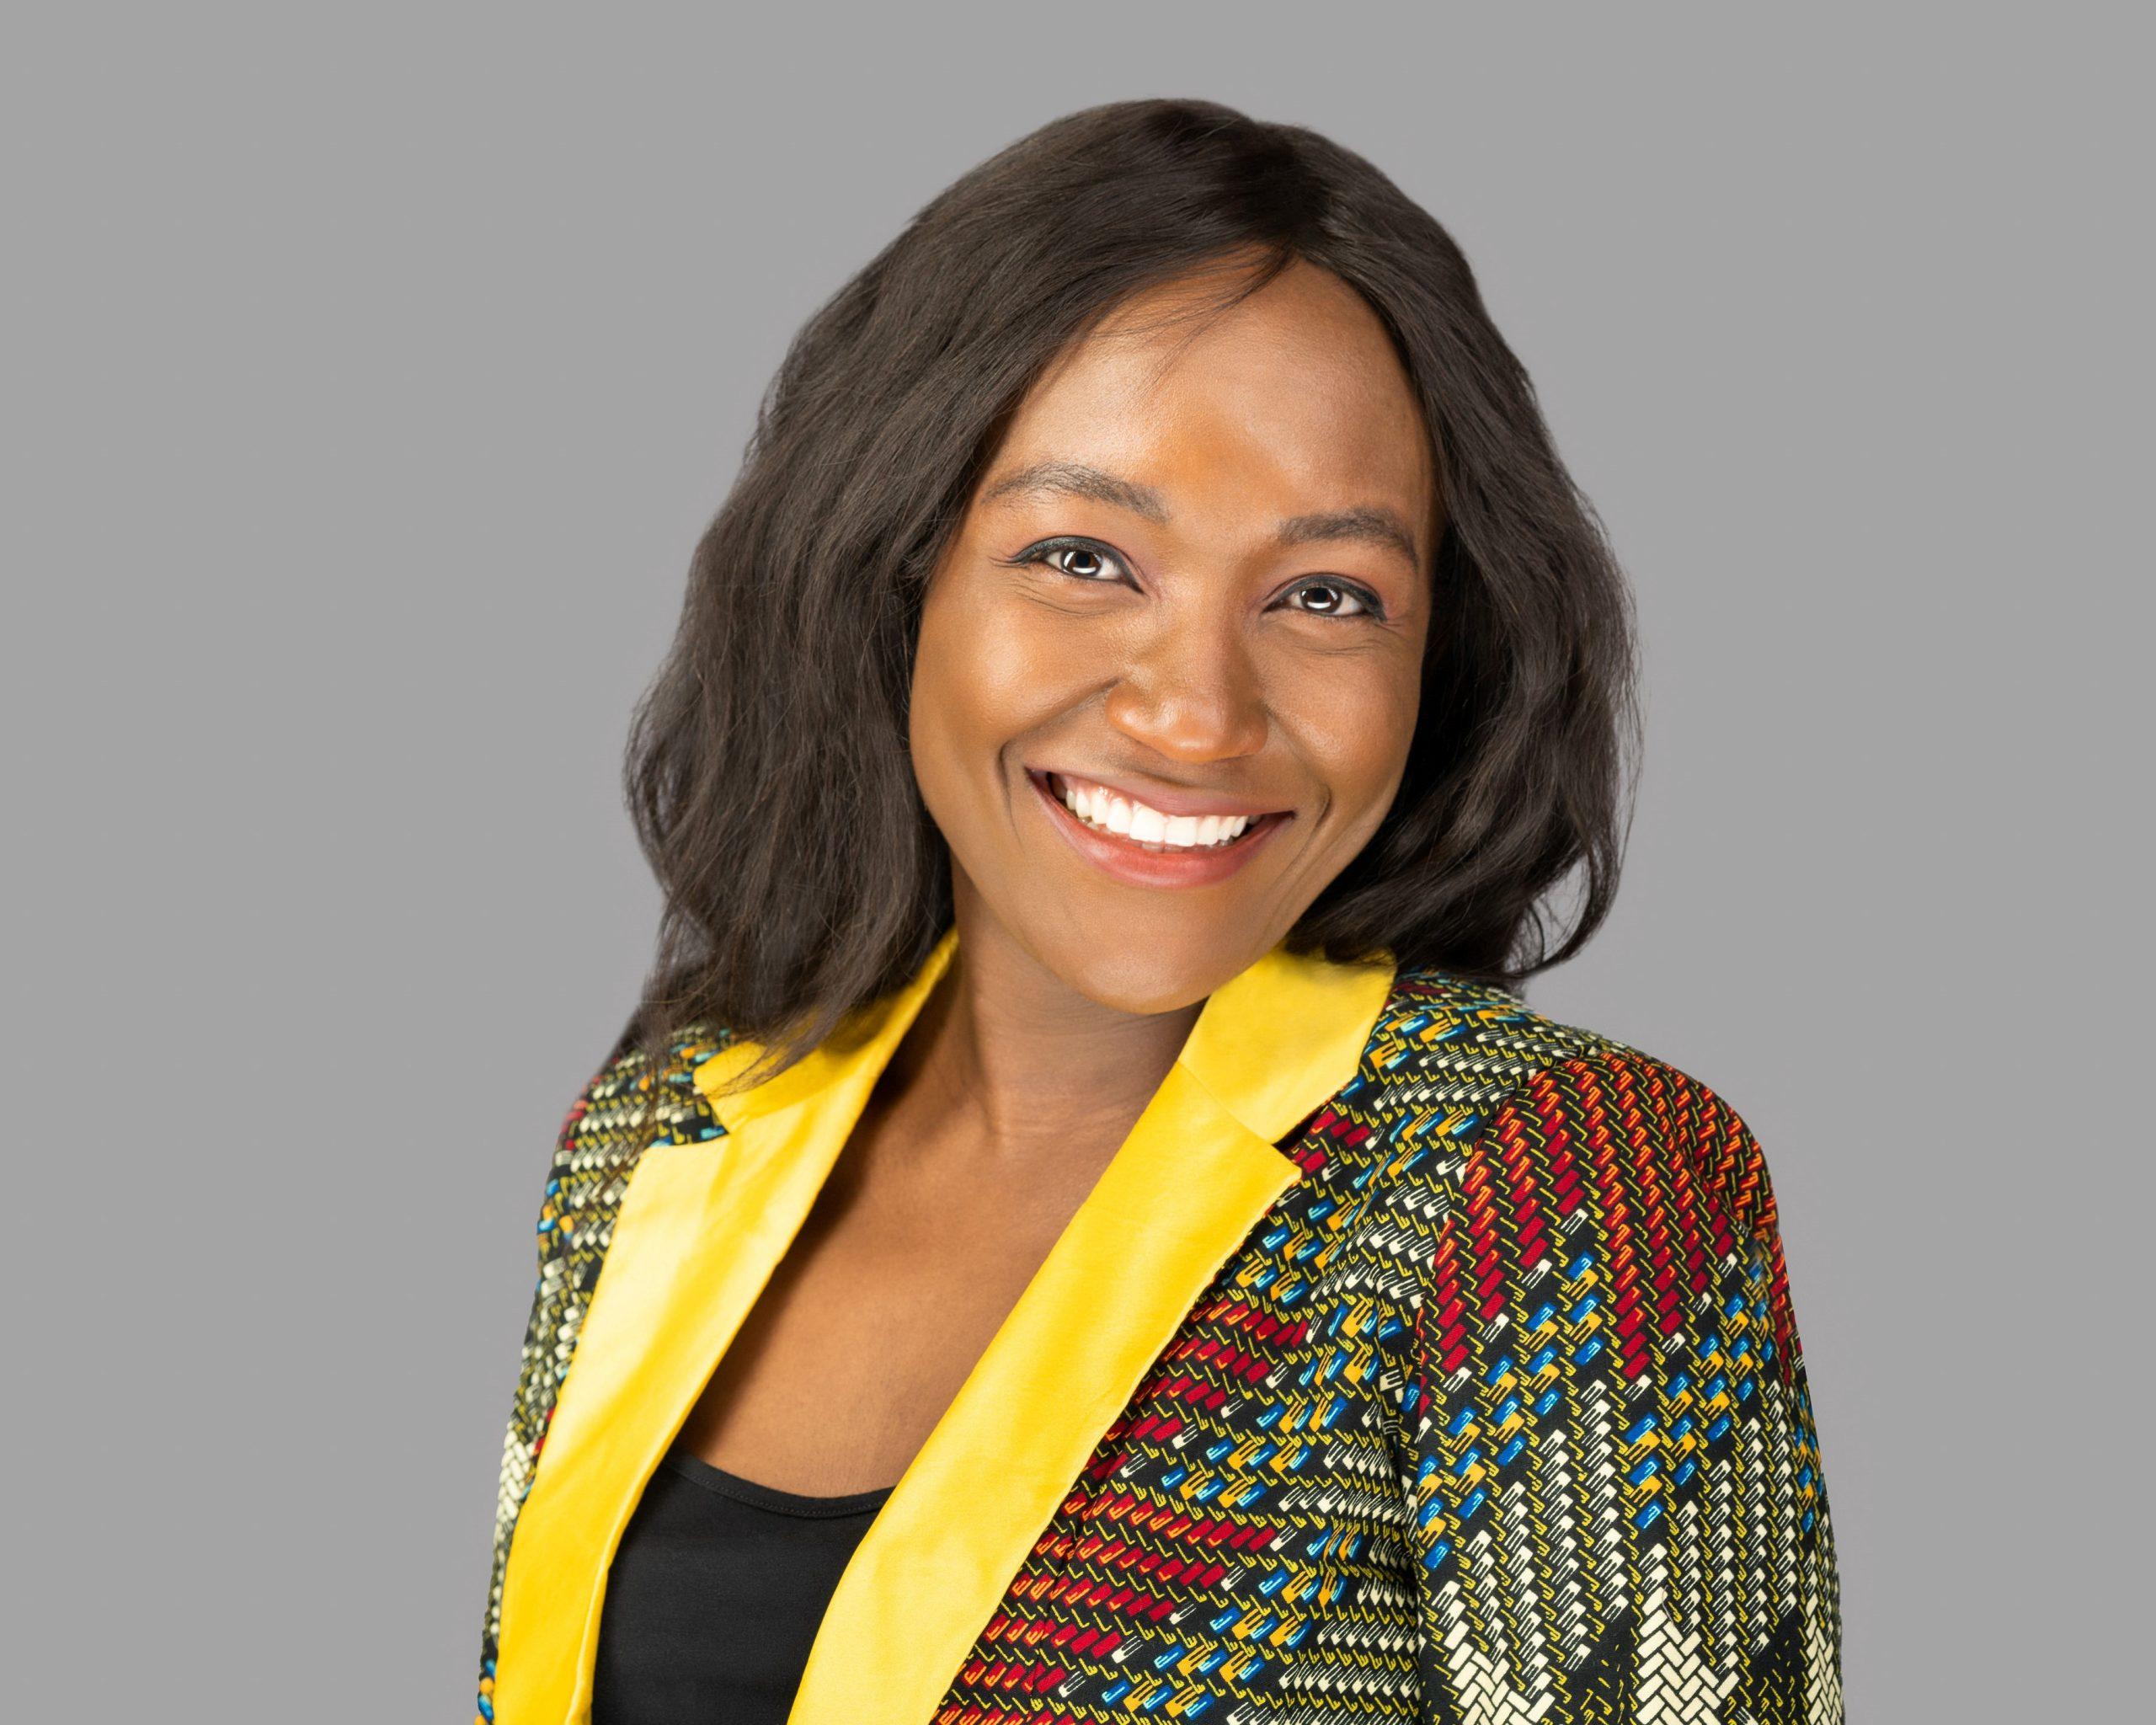 Entrepreneur en vedette: Marie-Rosette Mikulu